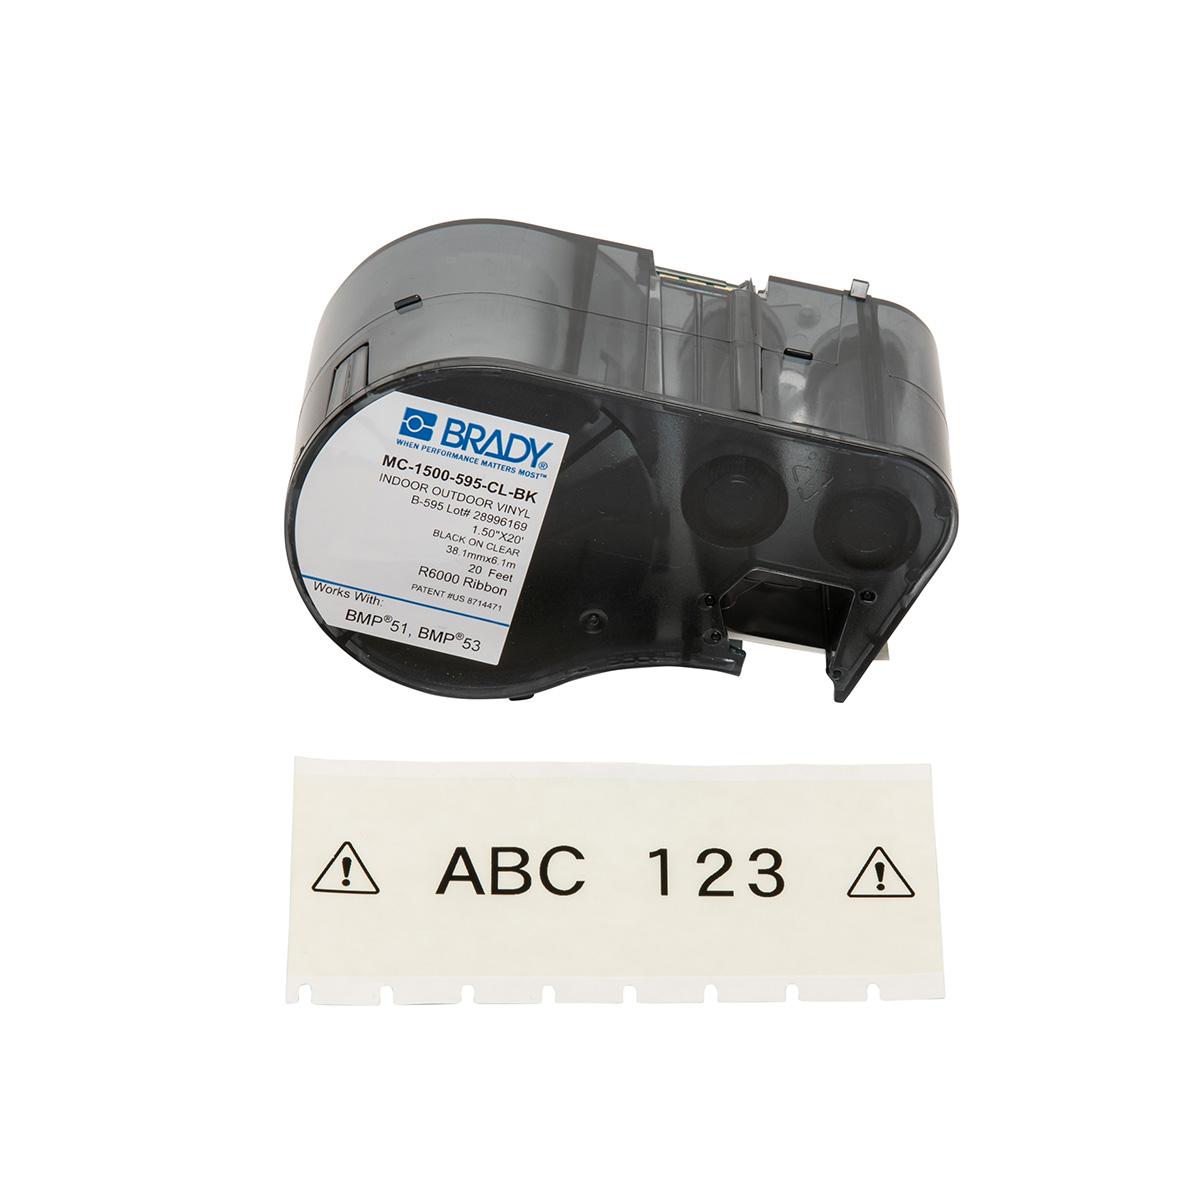 "BRADY MC-1500-595-CL-BK MseriesB595 Blk/Cl 1.50""X20' 1 Roll Hf"